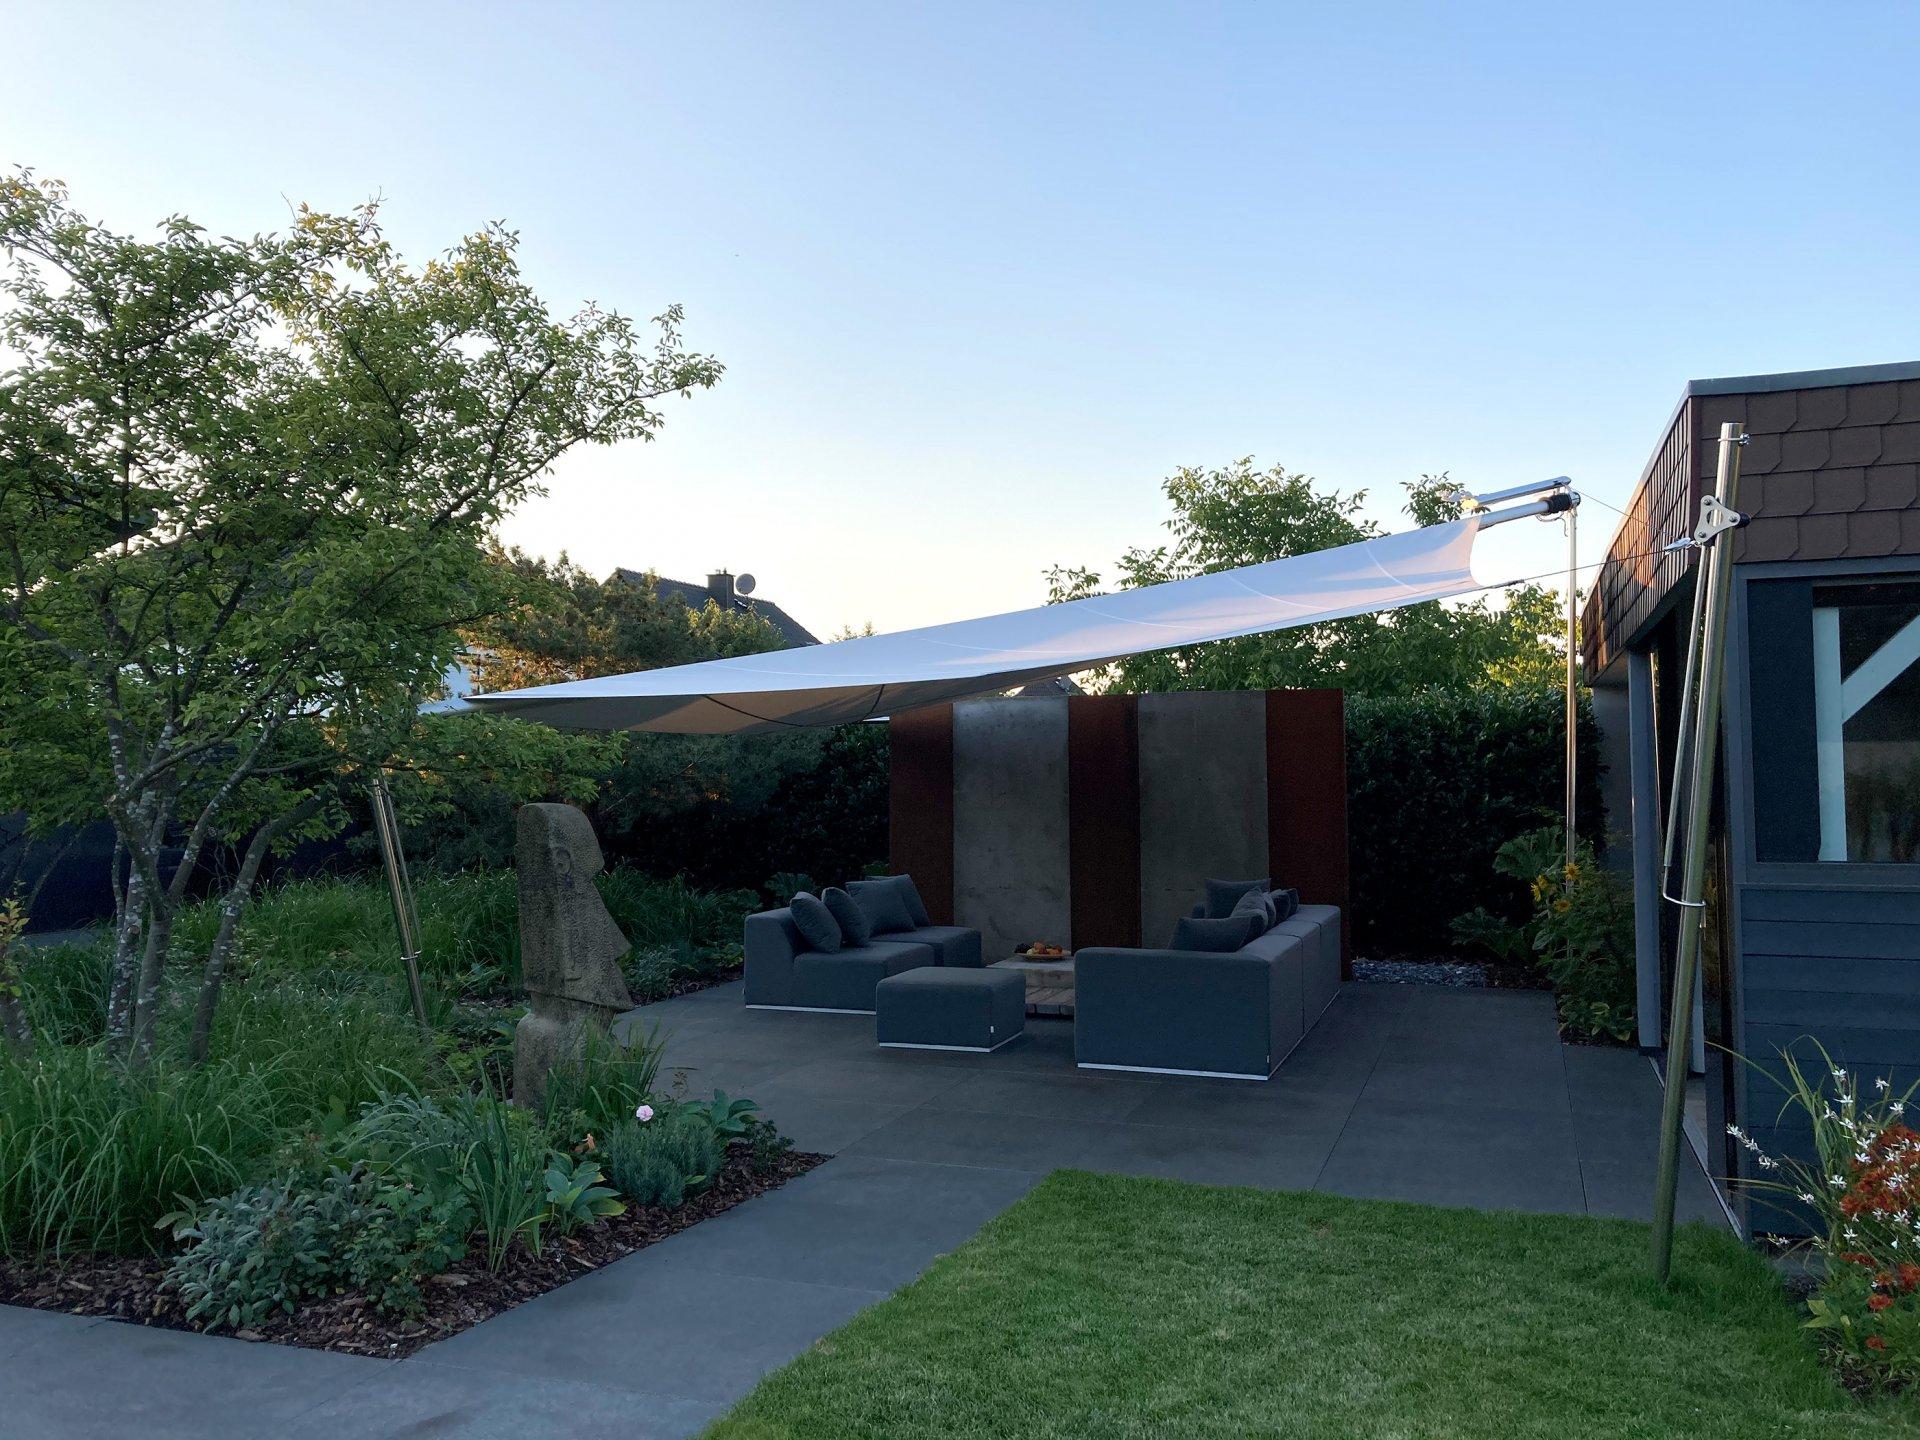 SunSquare vollautomatische Sonnensegel